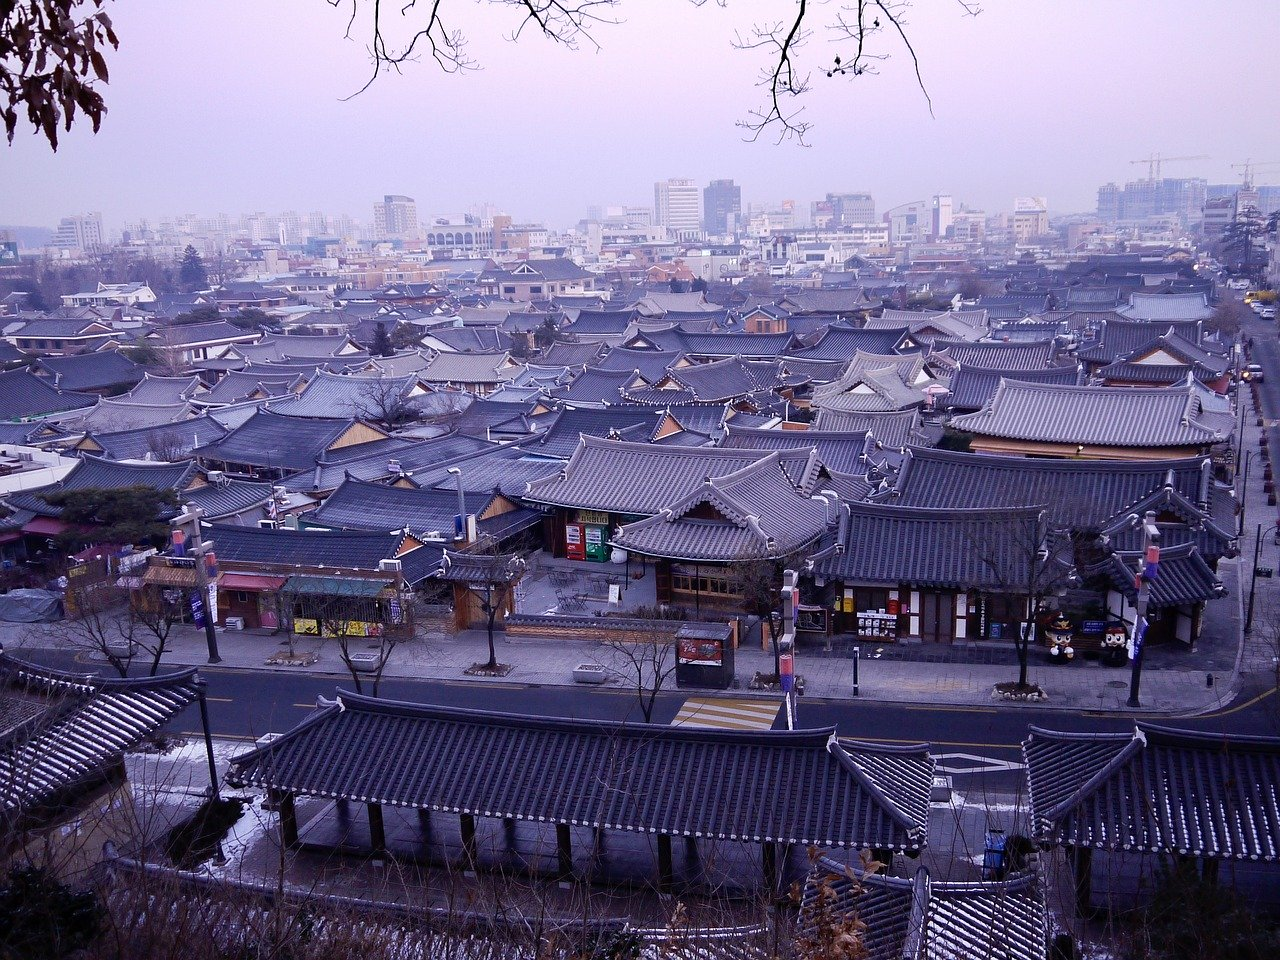 Jeonju Hanok Village: Korea's Past, Present and Future All in One!